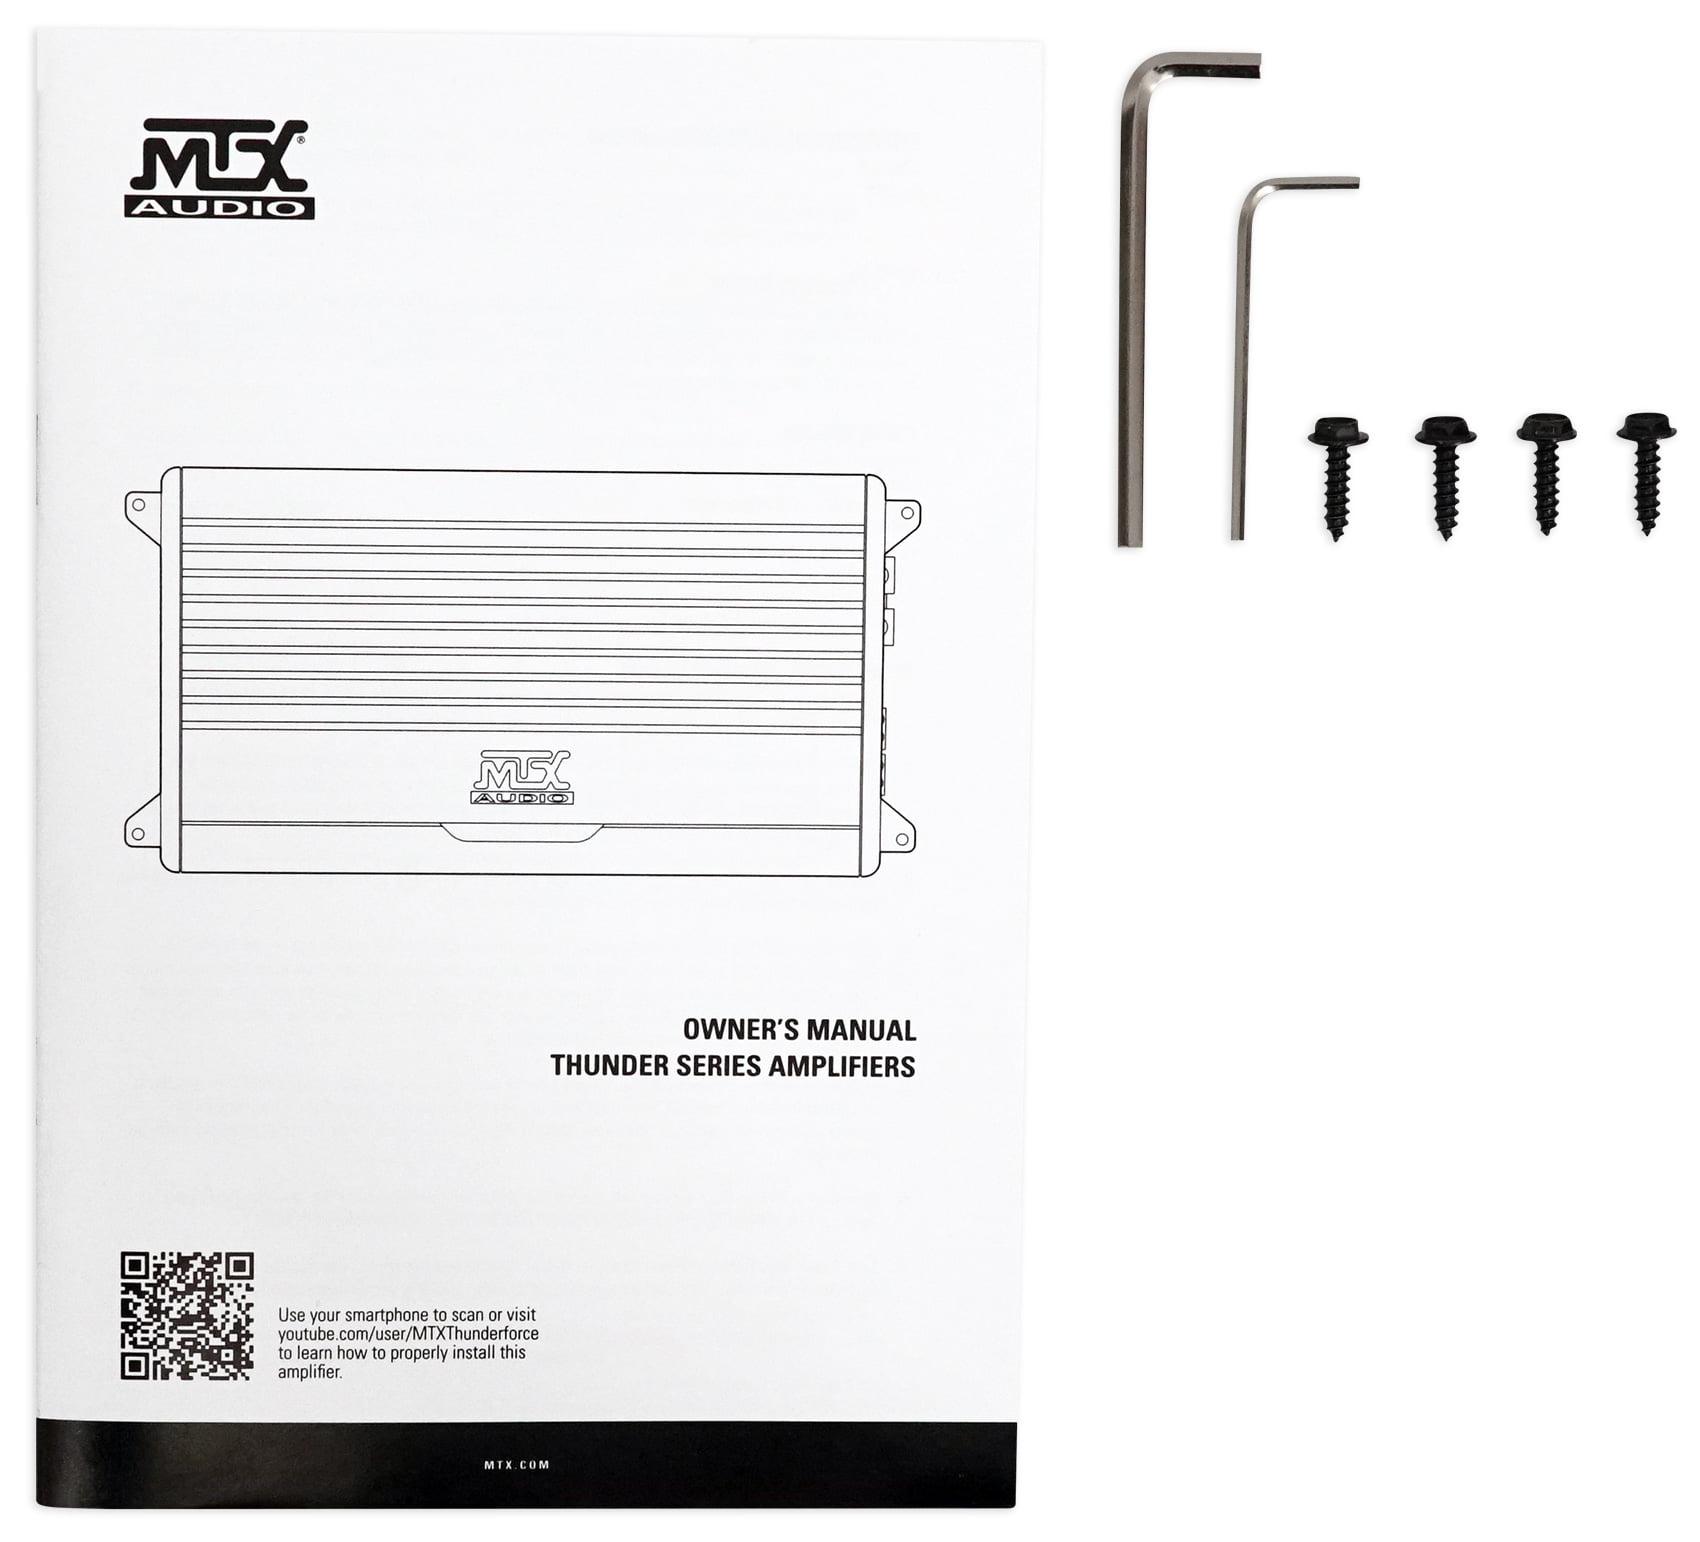 Mtx Thunder Amp Wiring Diagram - Wiring Diagrams on